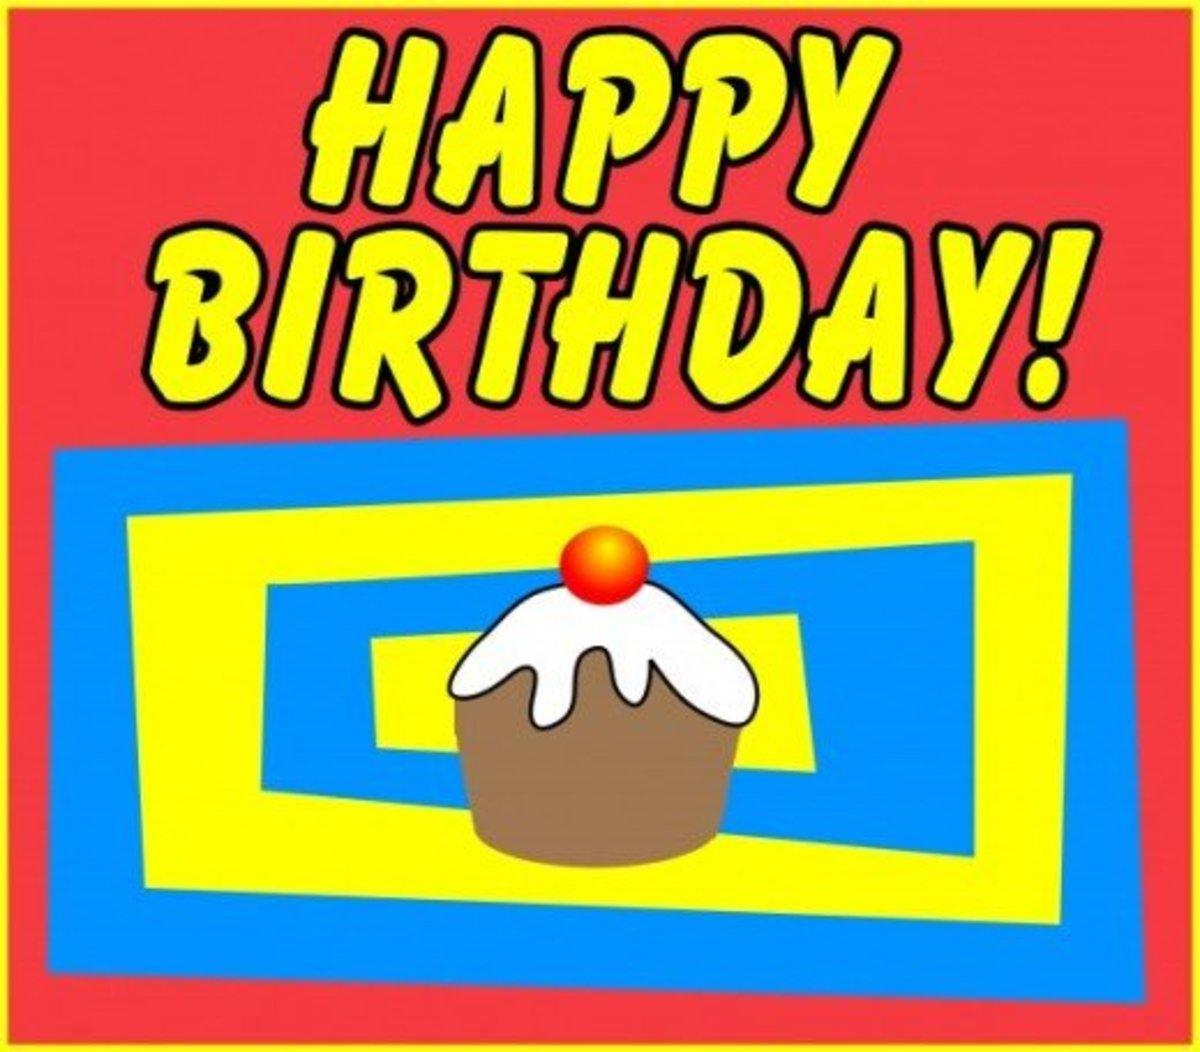 Happy Birthday! with Cupcake